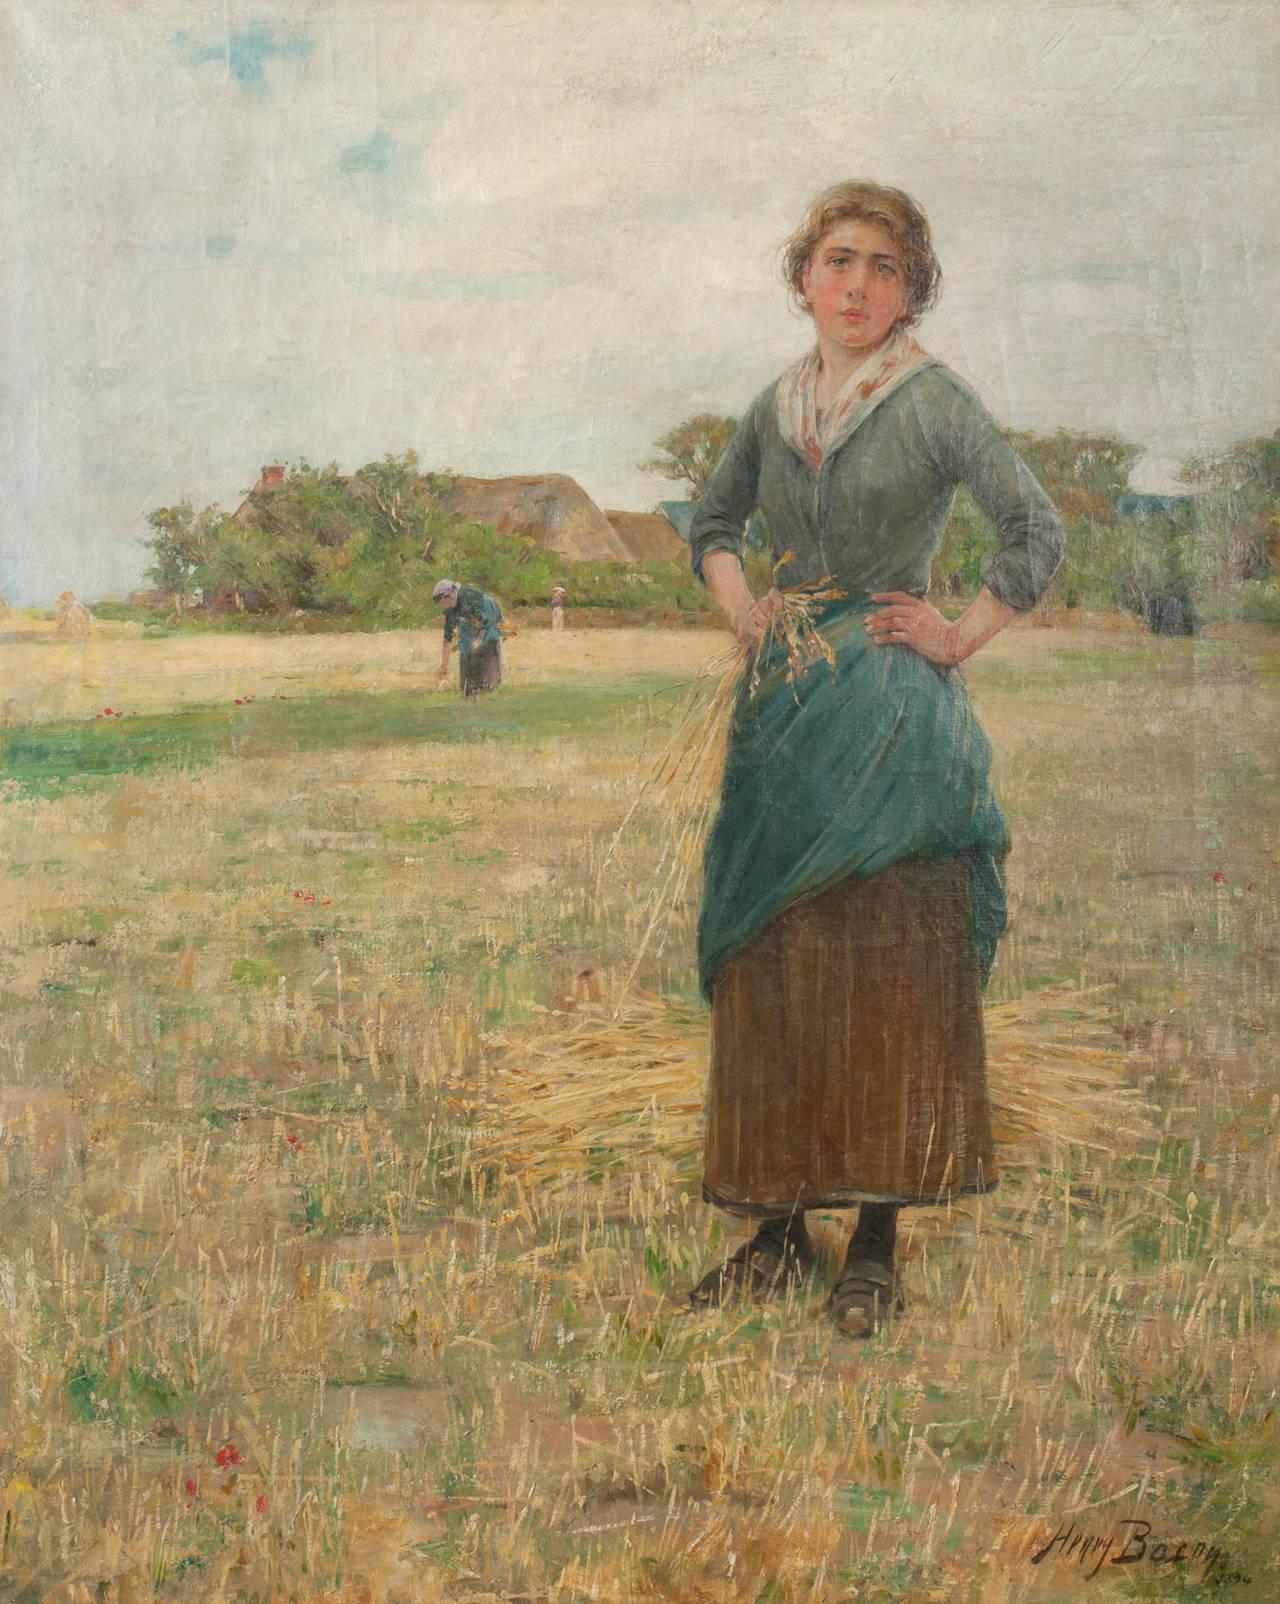 Woman In Field Painting : woman, field, painting, Henry, Bacon, Woman, Field, 1stDibs